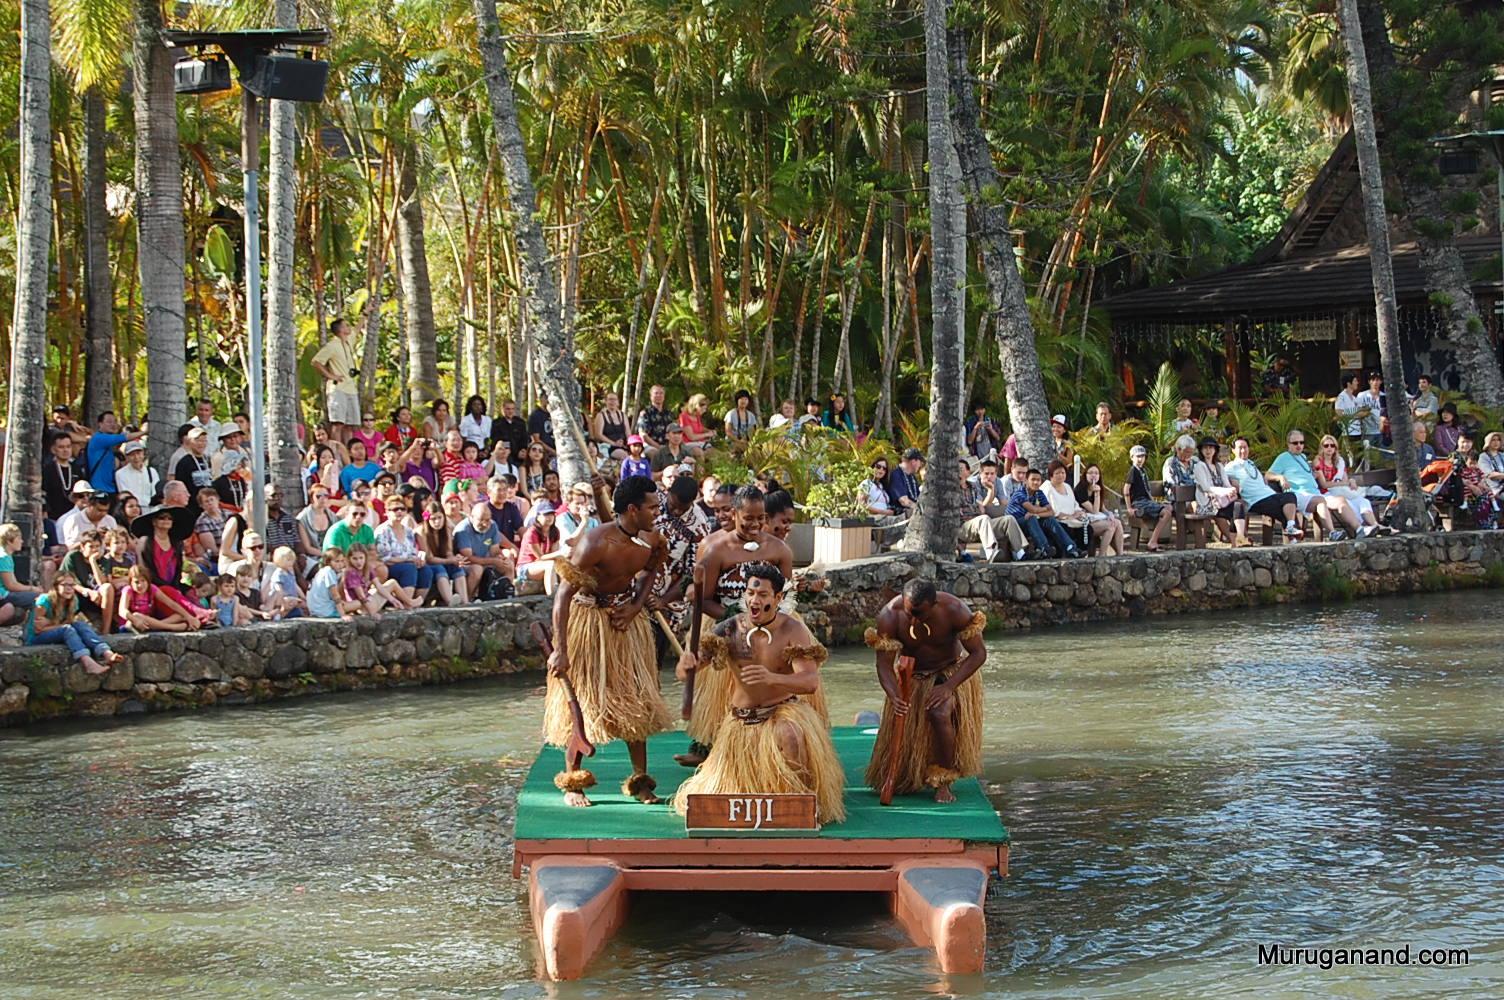 Fiji Float (O'ahu)